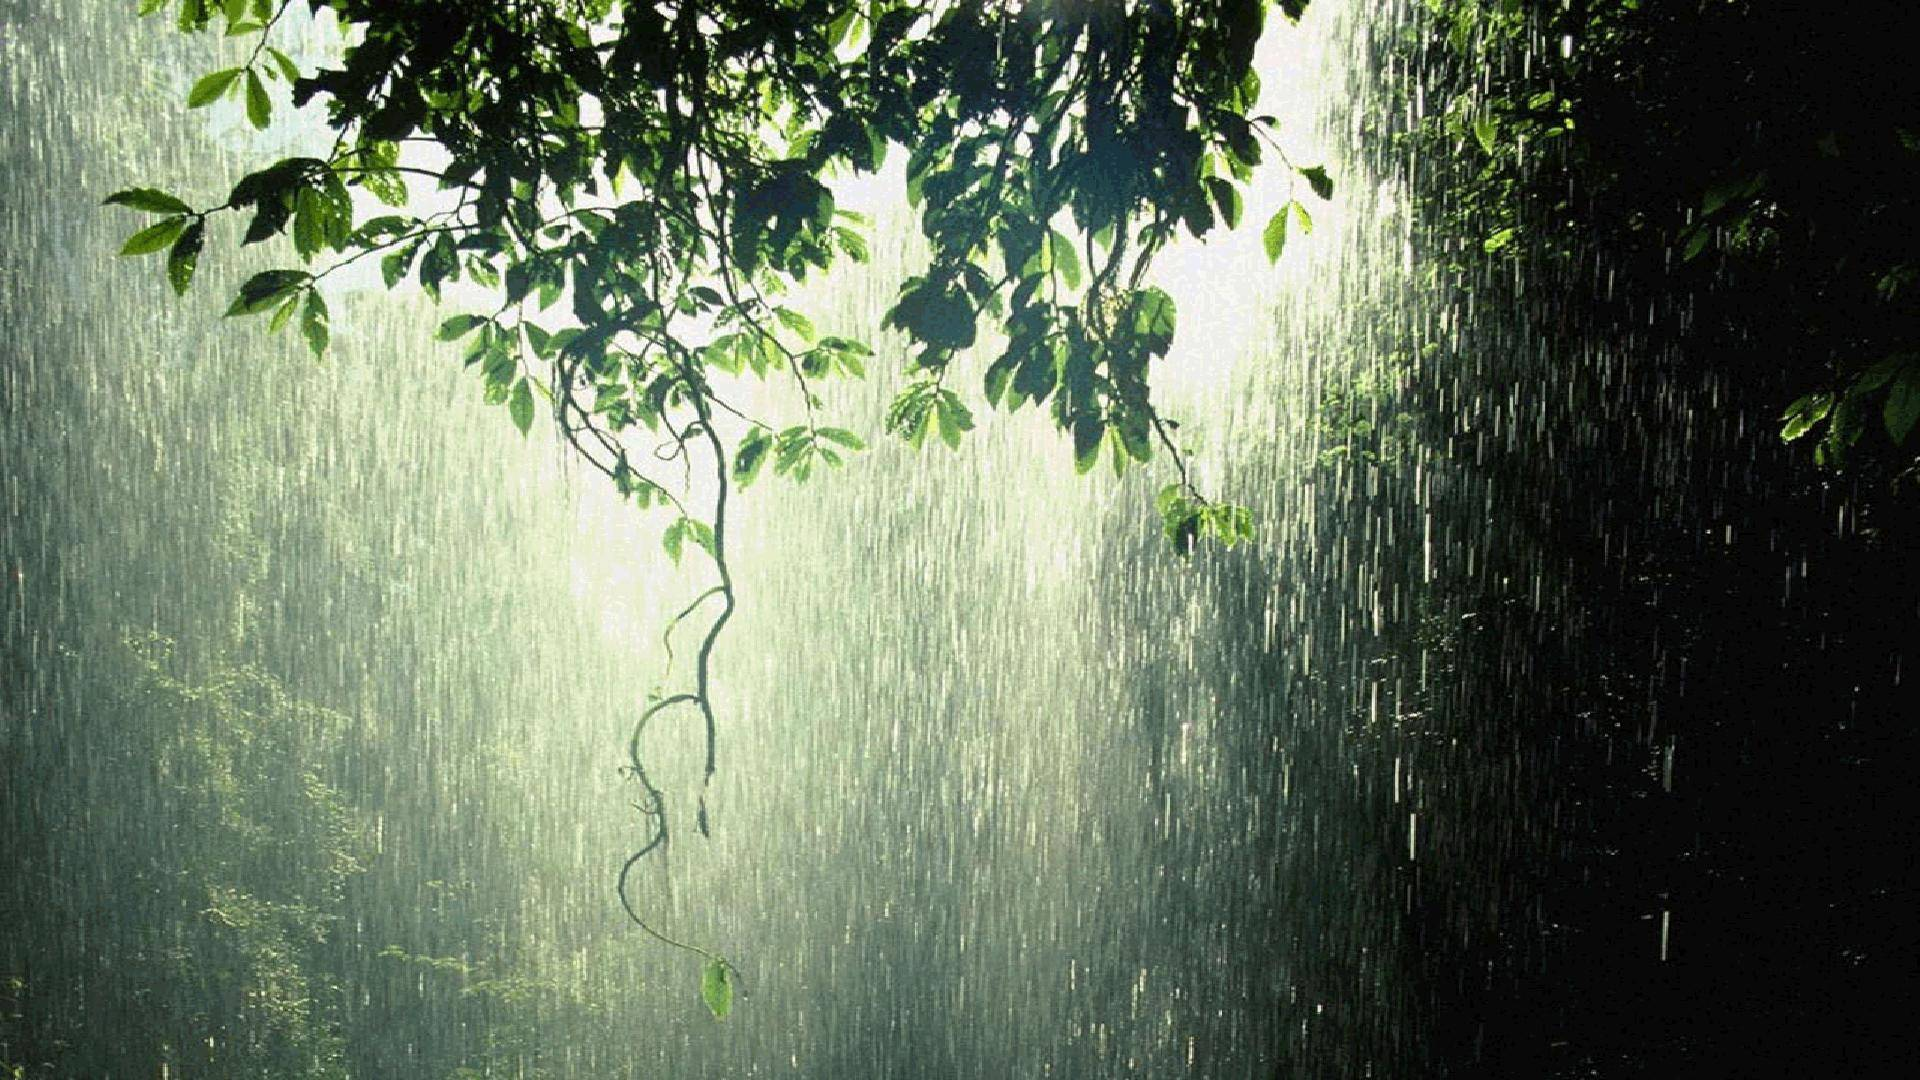 Rainfall in Mauritius